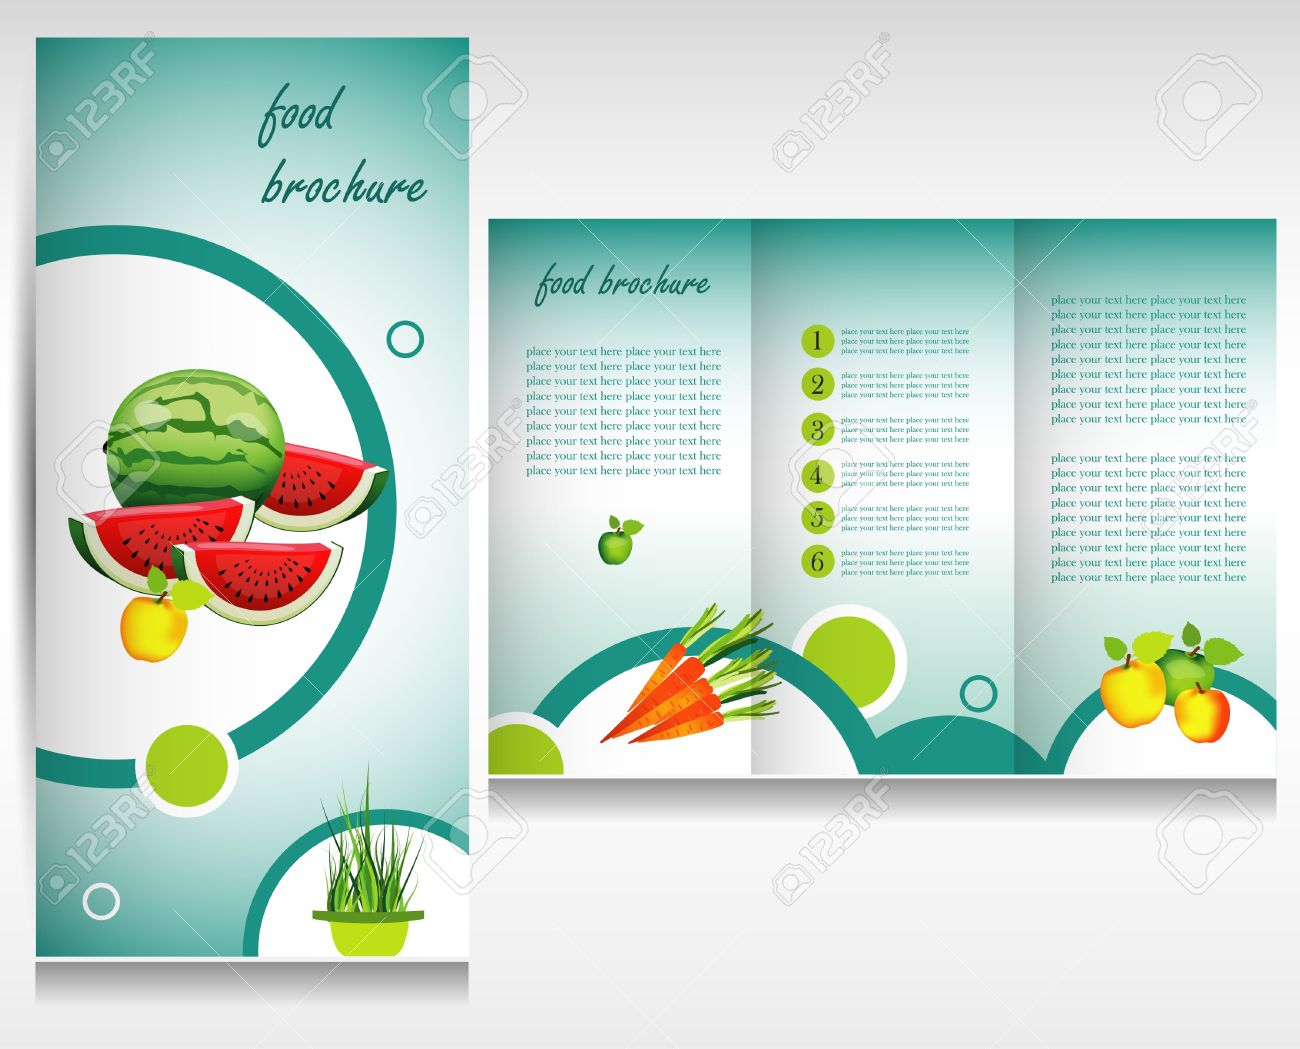 Food Brochure Design Concept Royalty Free Cliparts, Vectors, And ...